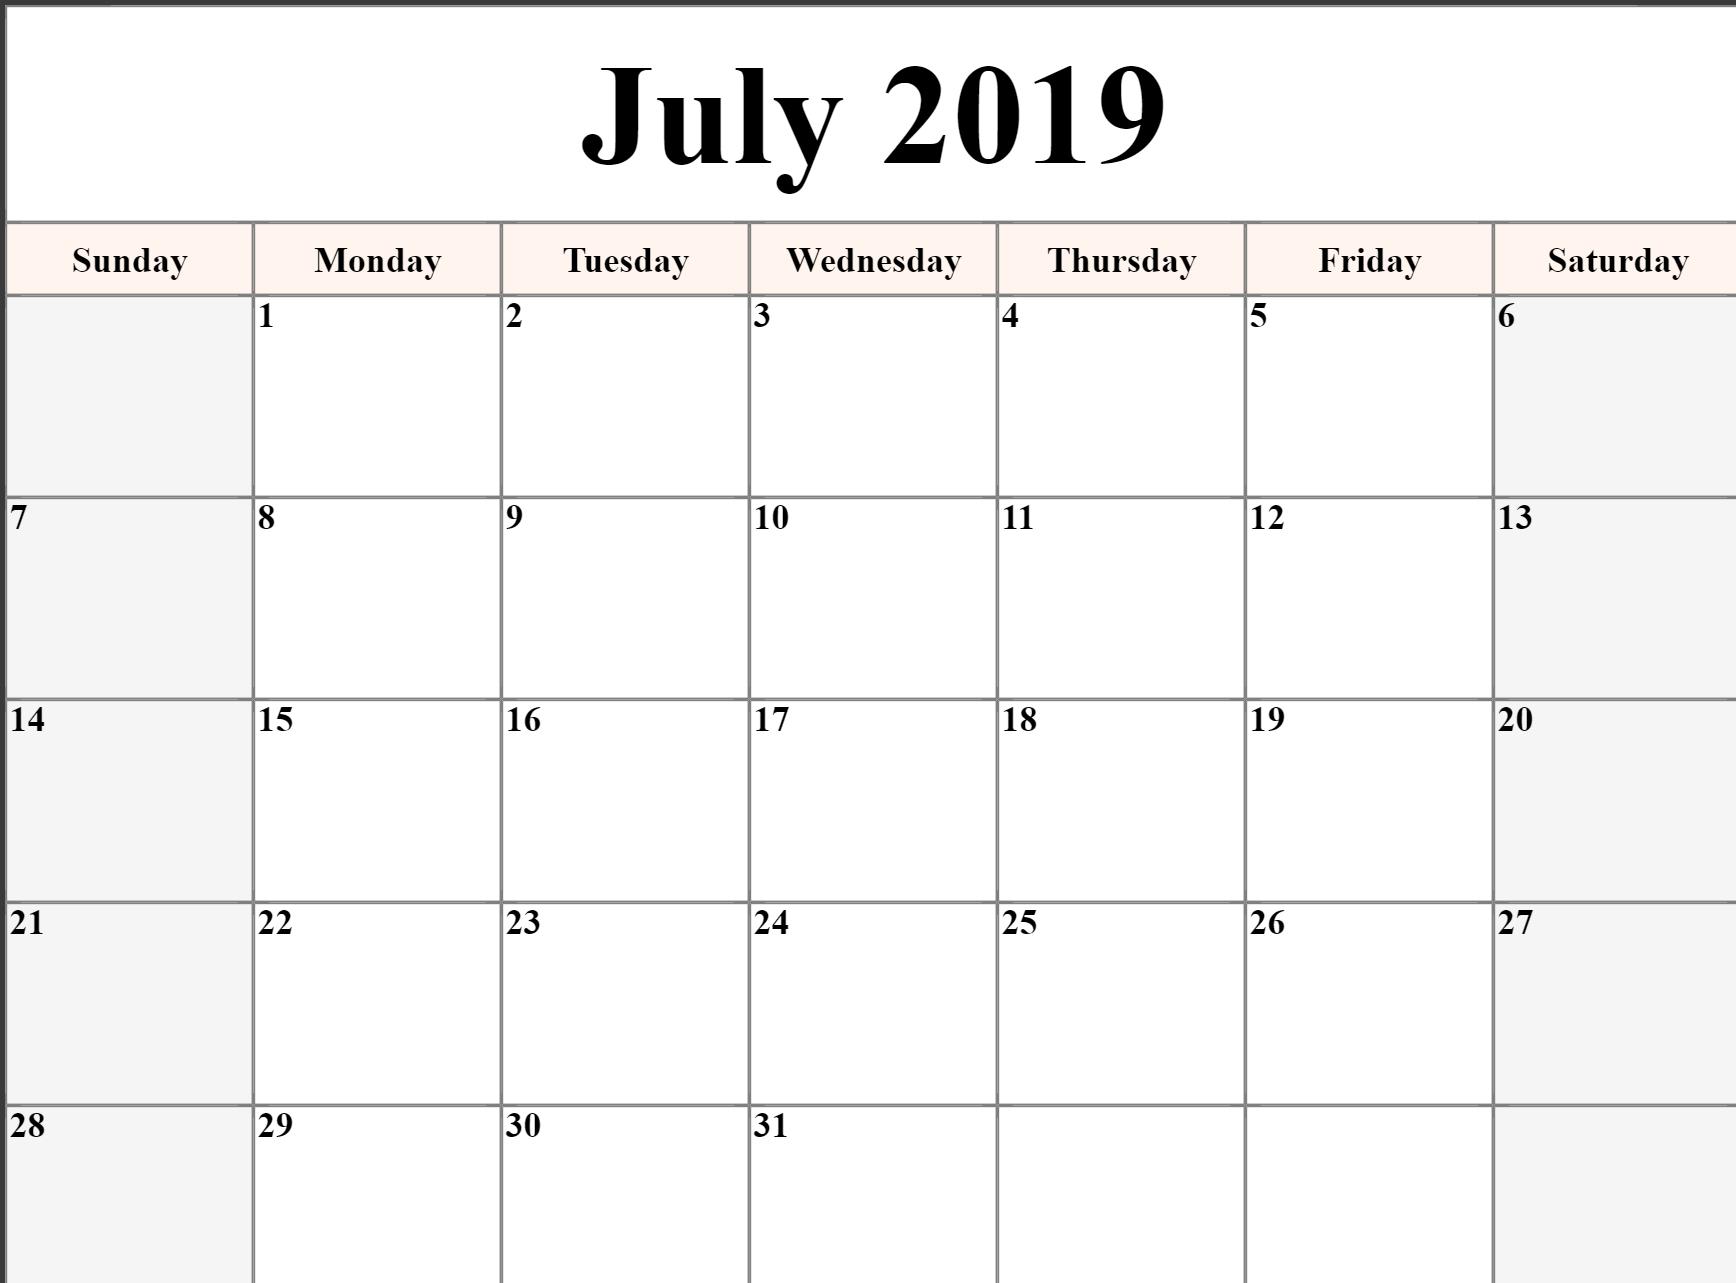 Free Printable July 2019 Calendar Download - Free Printable Calendar inside July Calendar Monday To Sunday